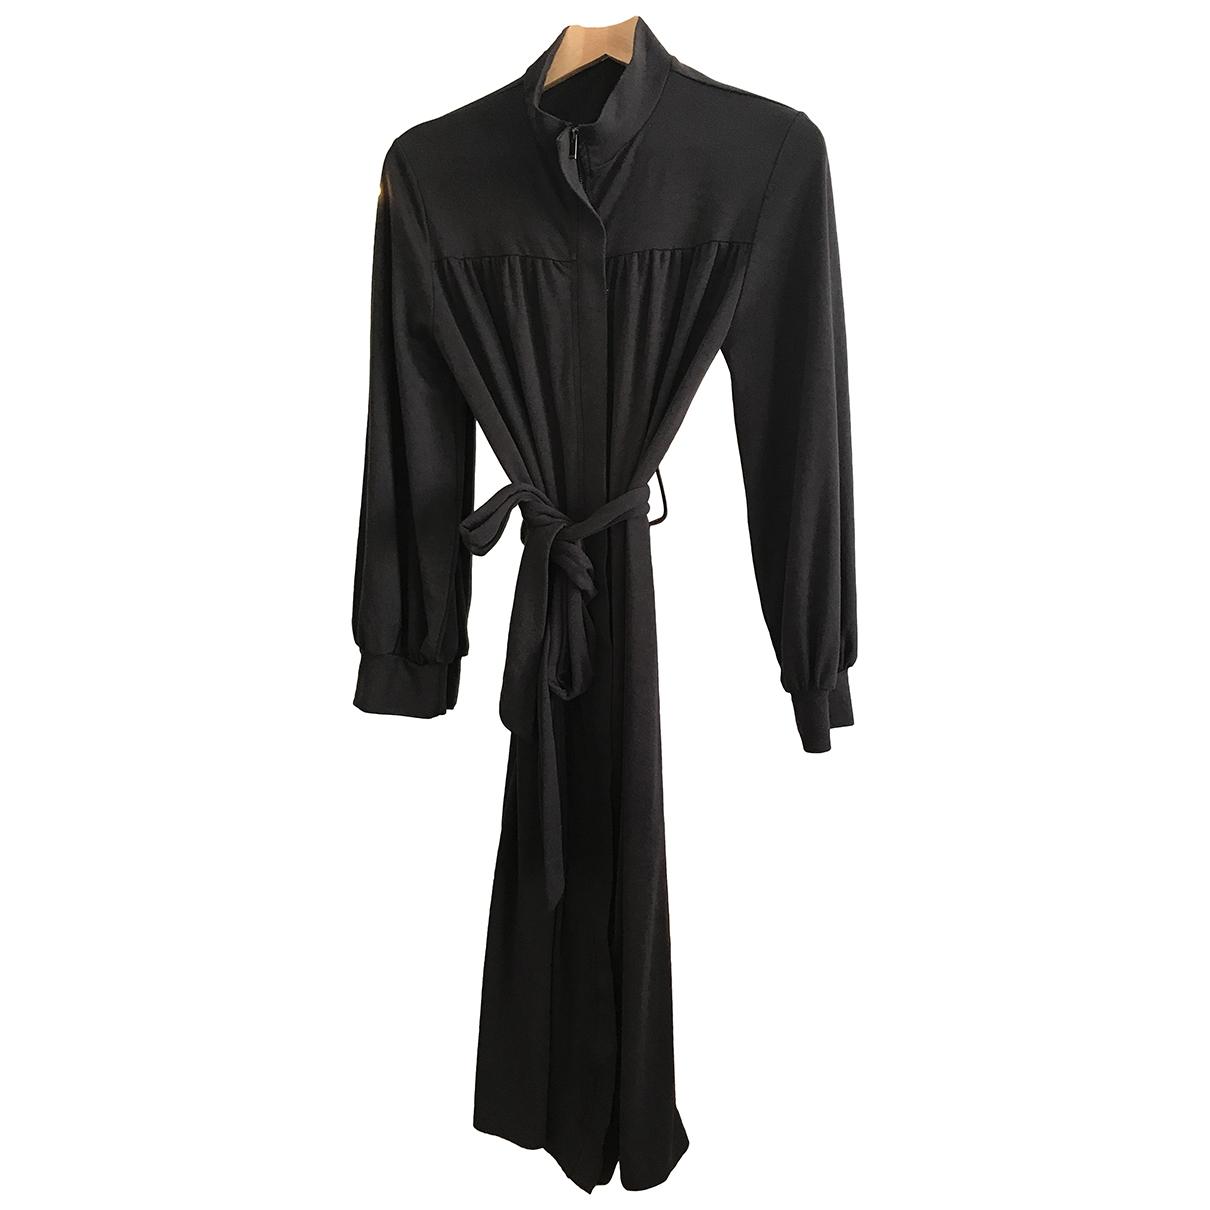 Zara \N Grey Cotton dress for Women 36 FR